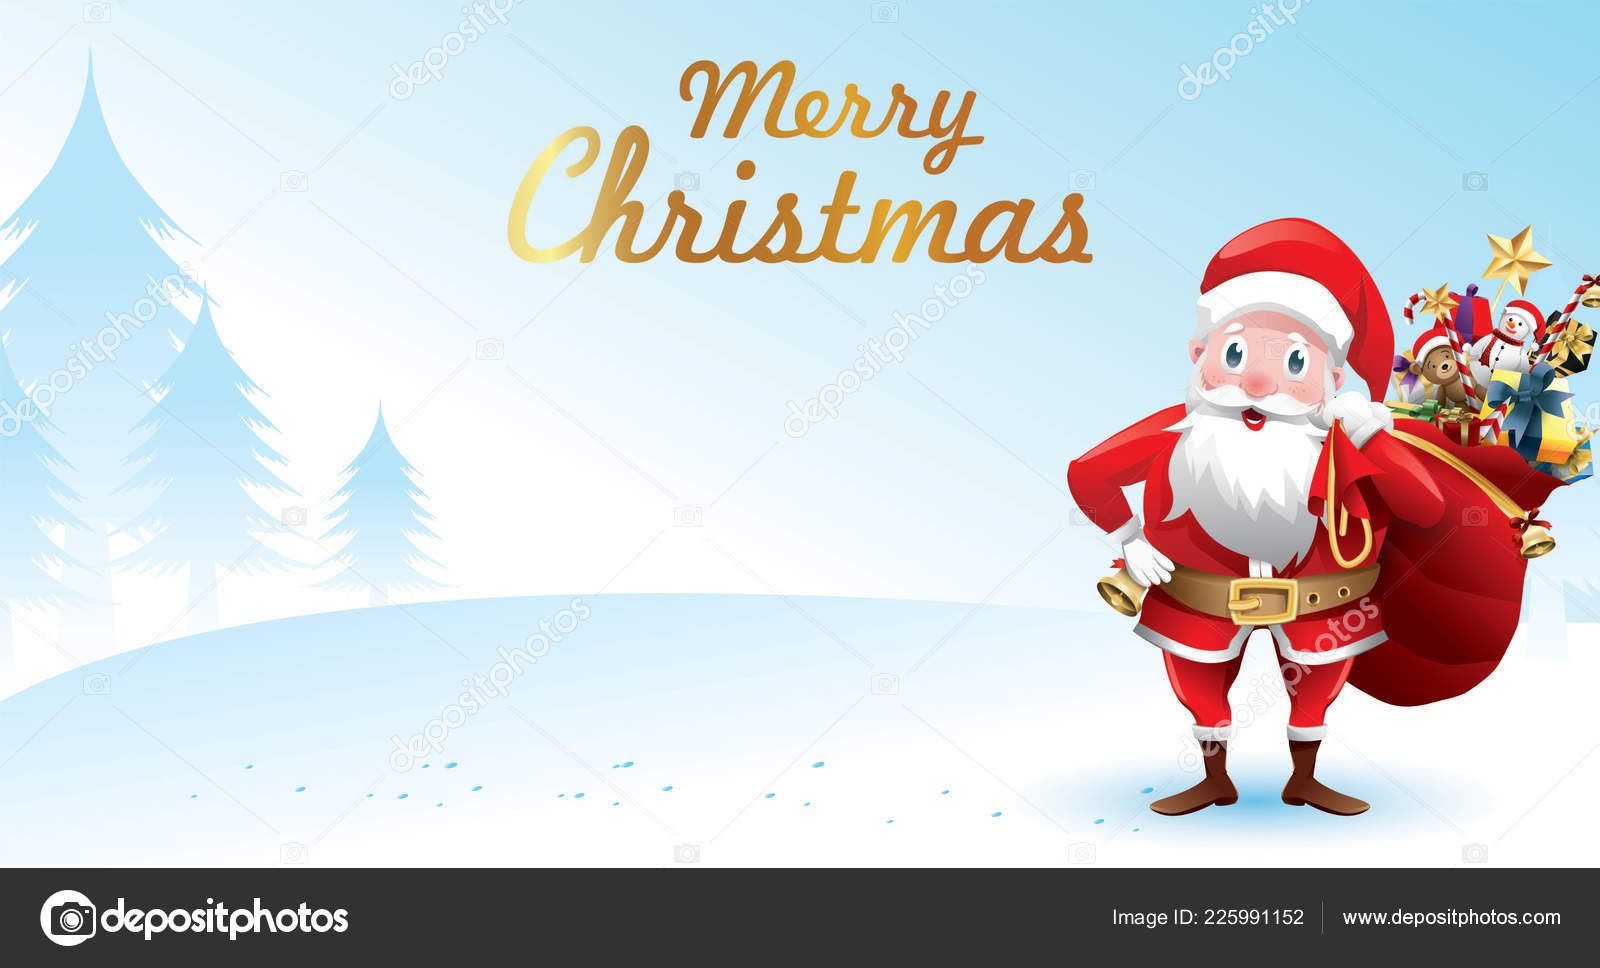 Merry Christmas And Happy New Year Christmas Card Santa